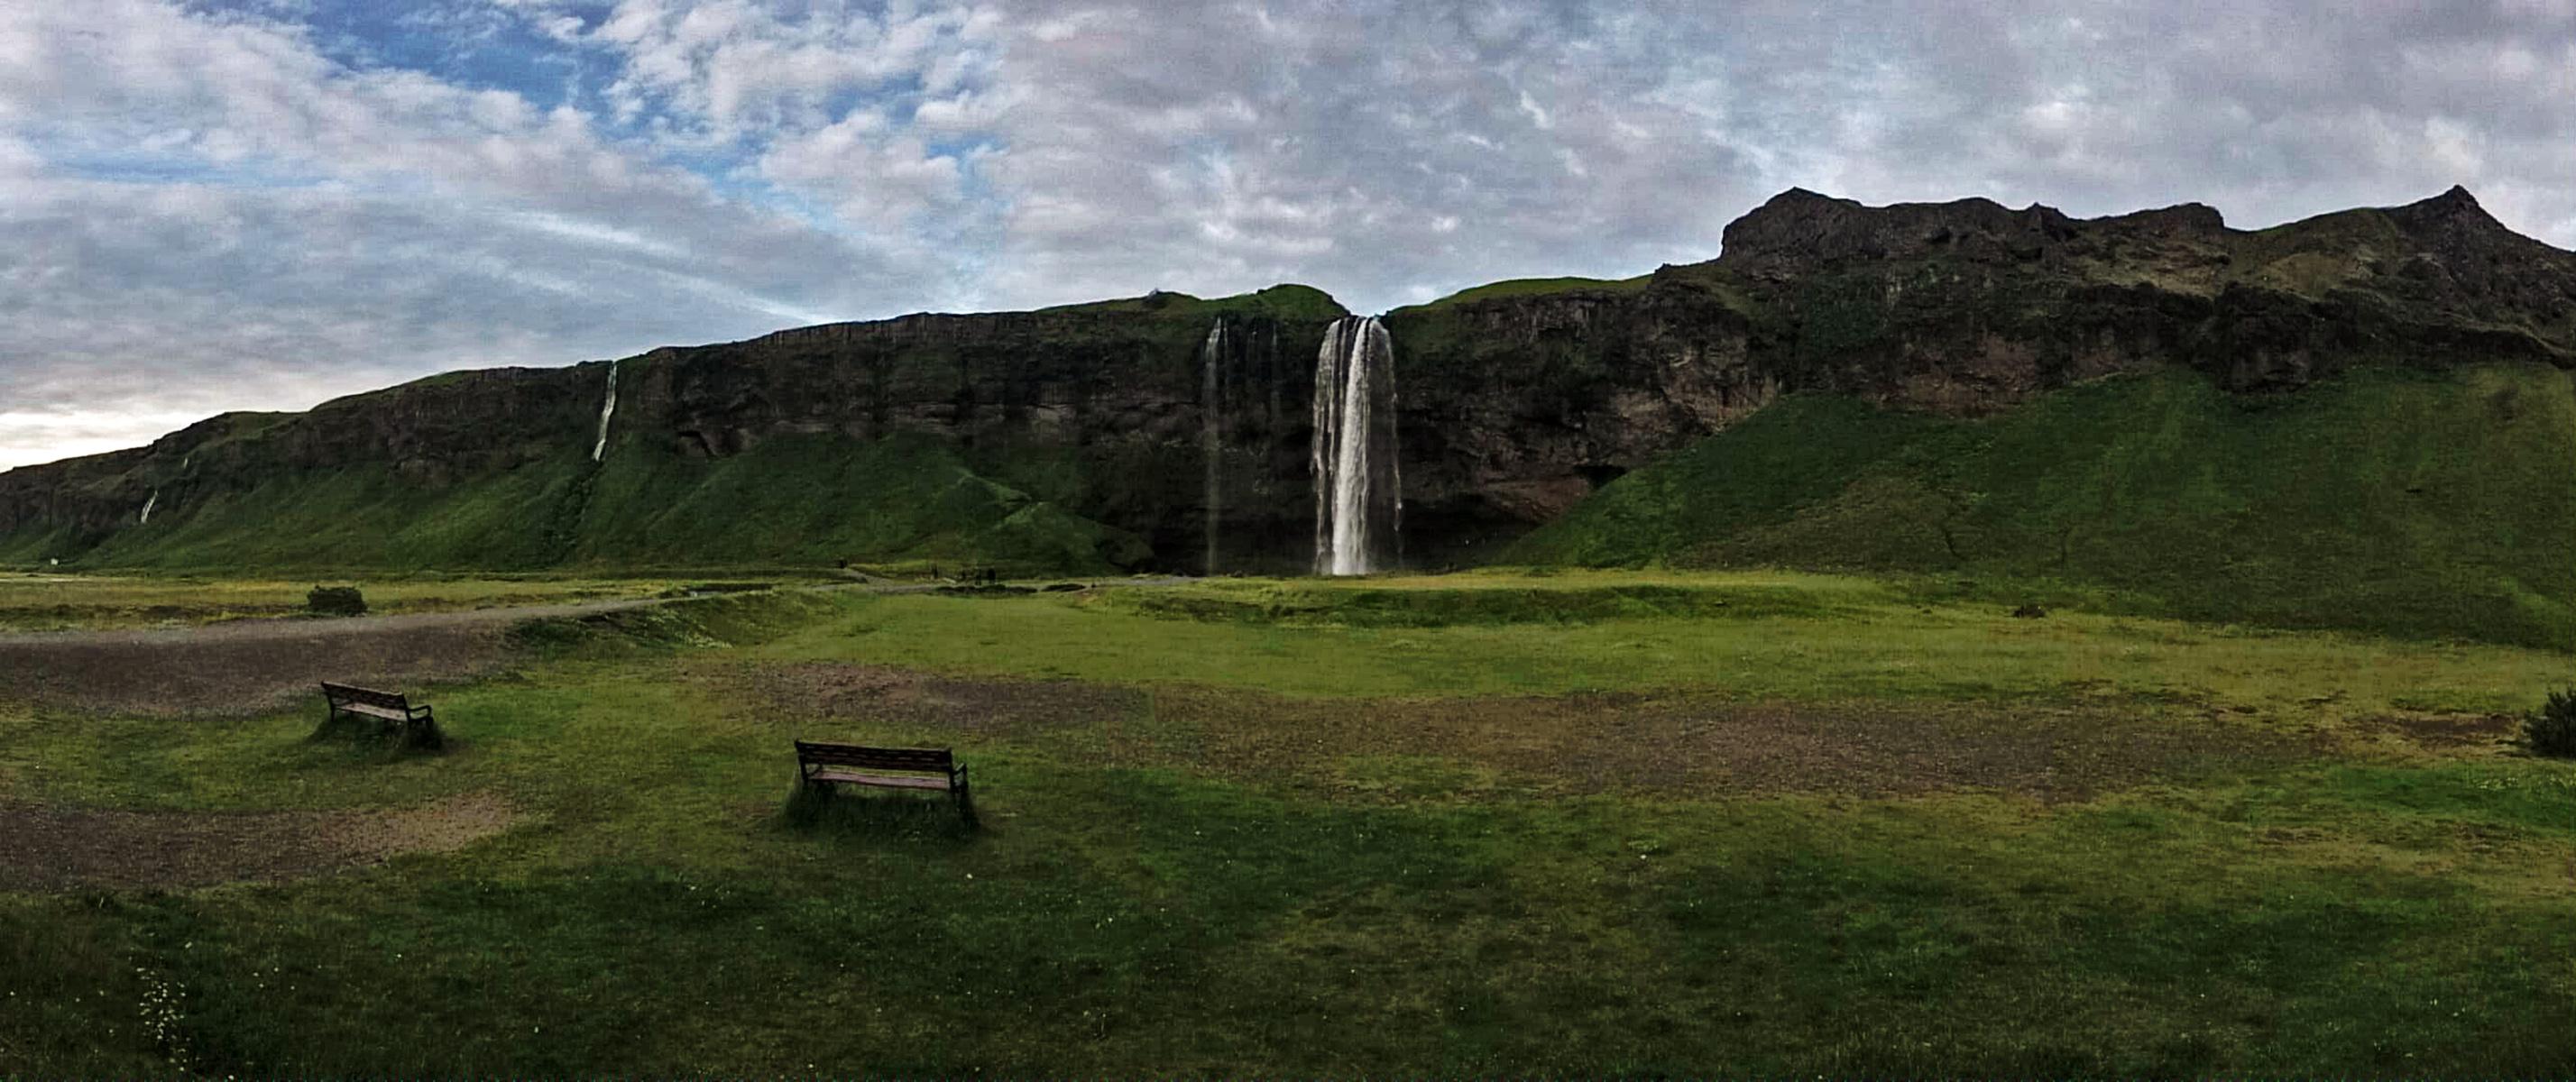 17. Seljalandsfoss